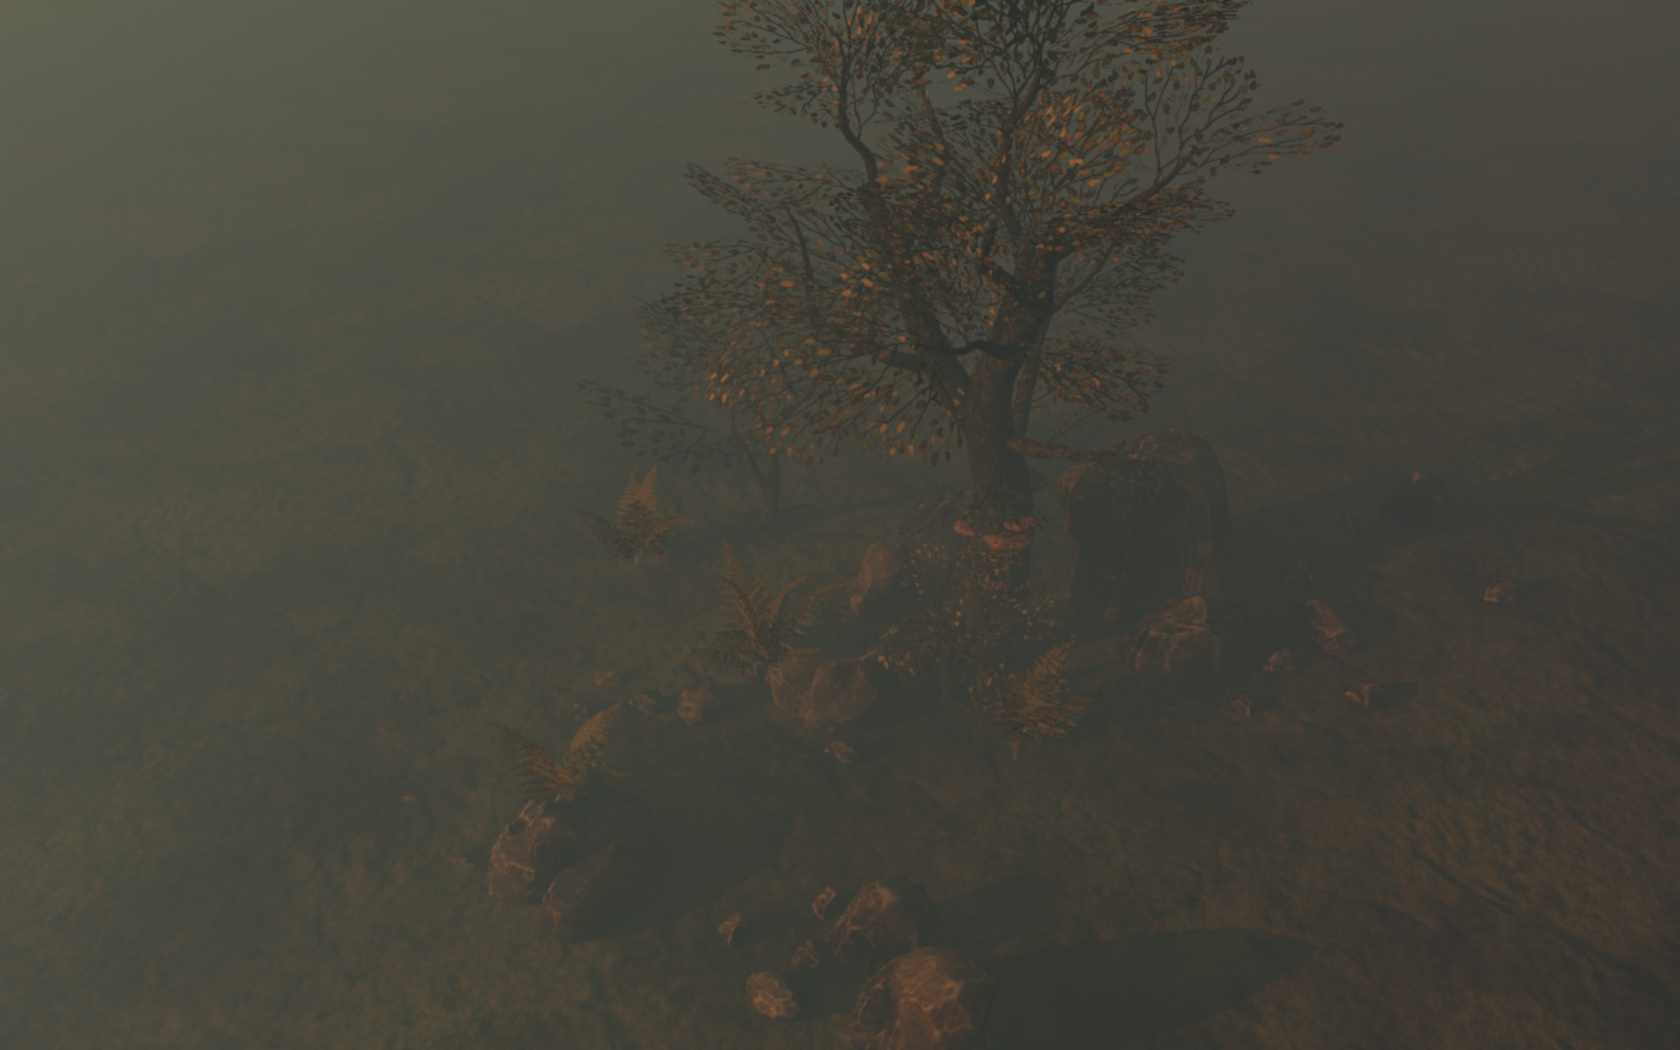 tree1_0039.jpg